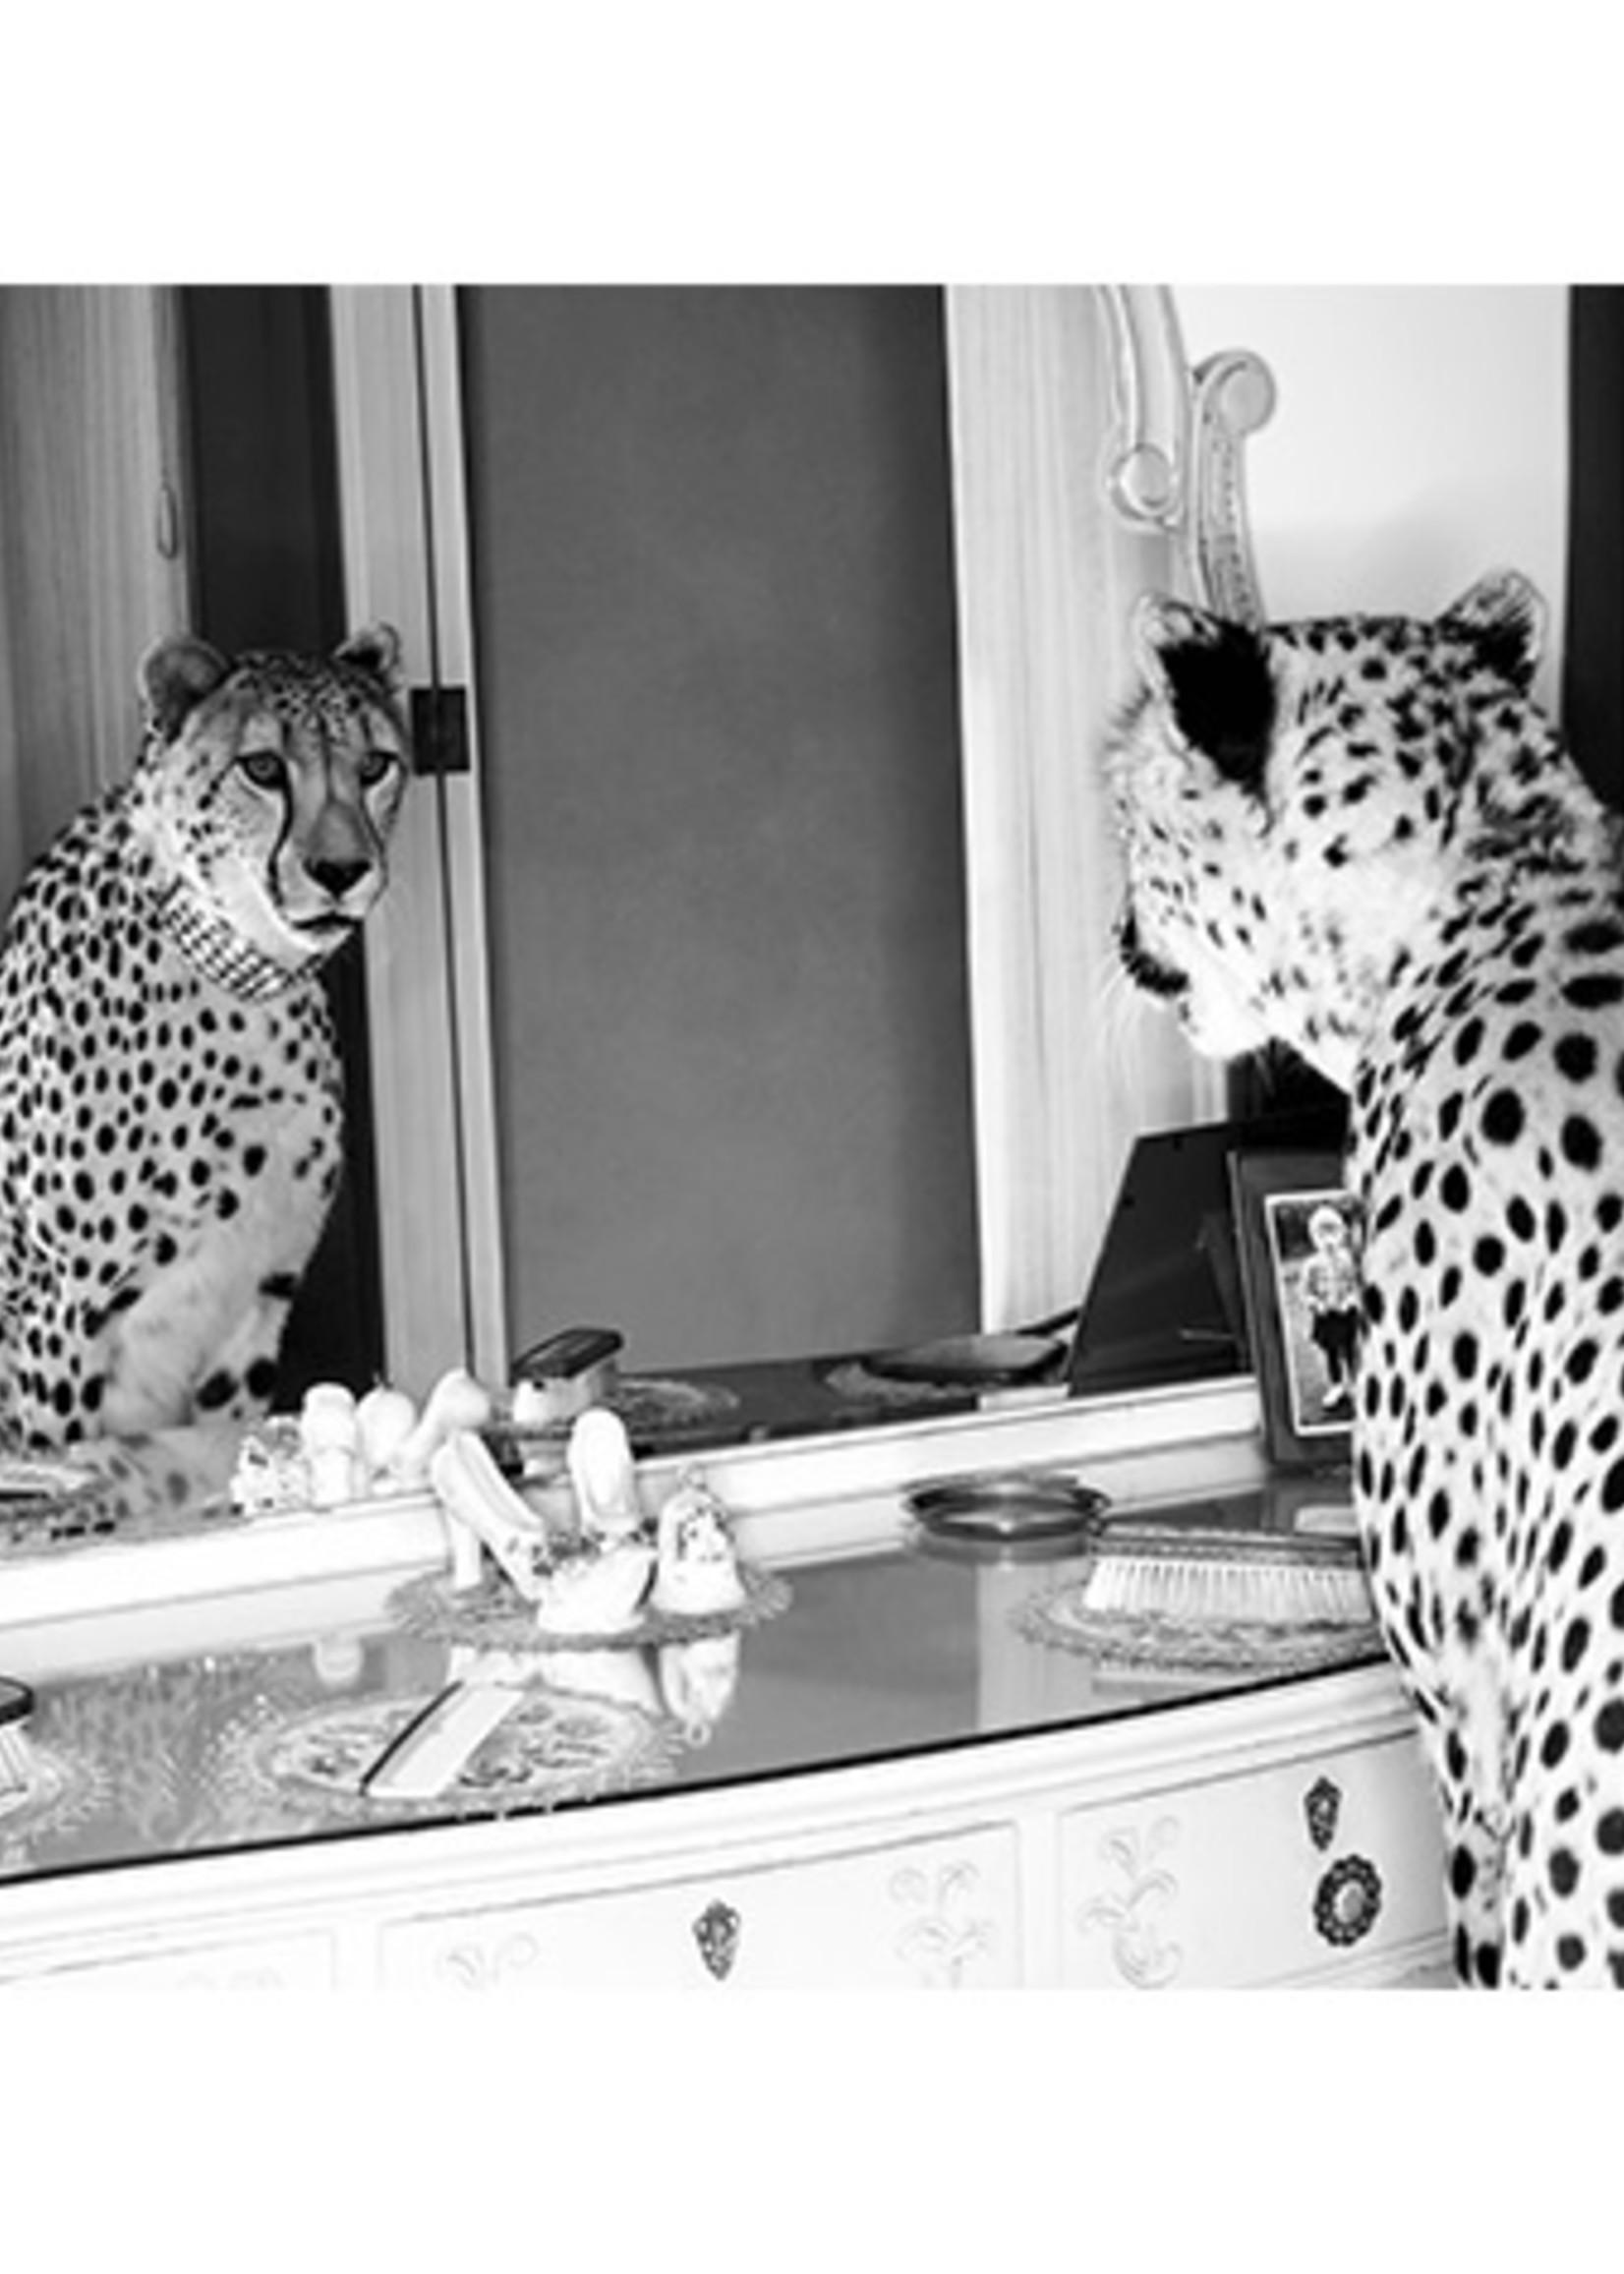 MondiArt Cheetah looking in mirror 24/30